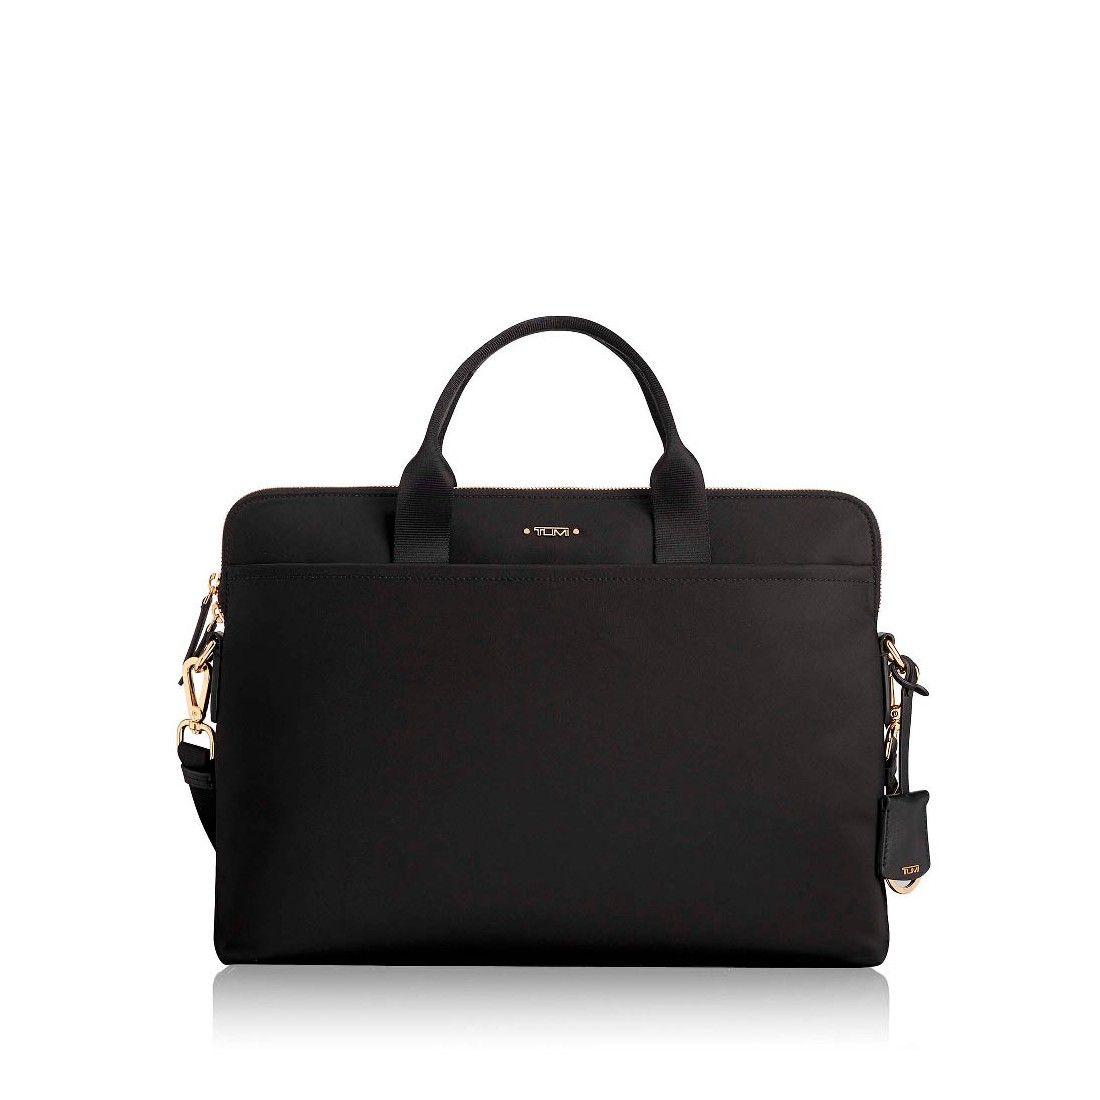 Cartera maletín Joanne - Tumi - 1